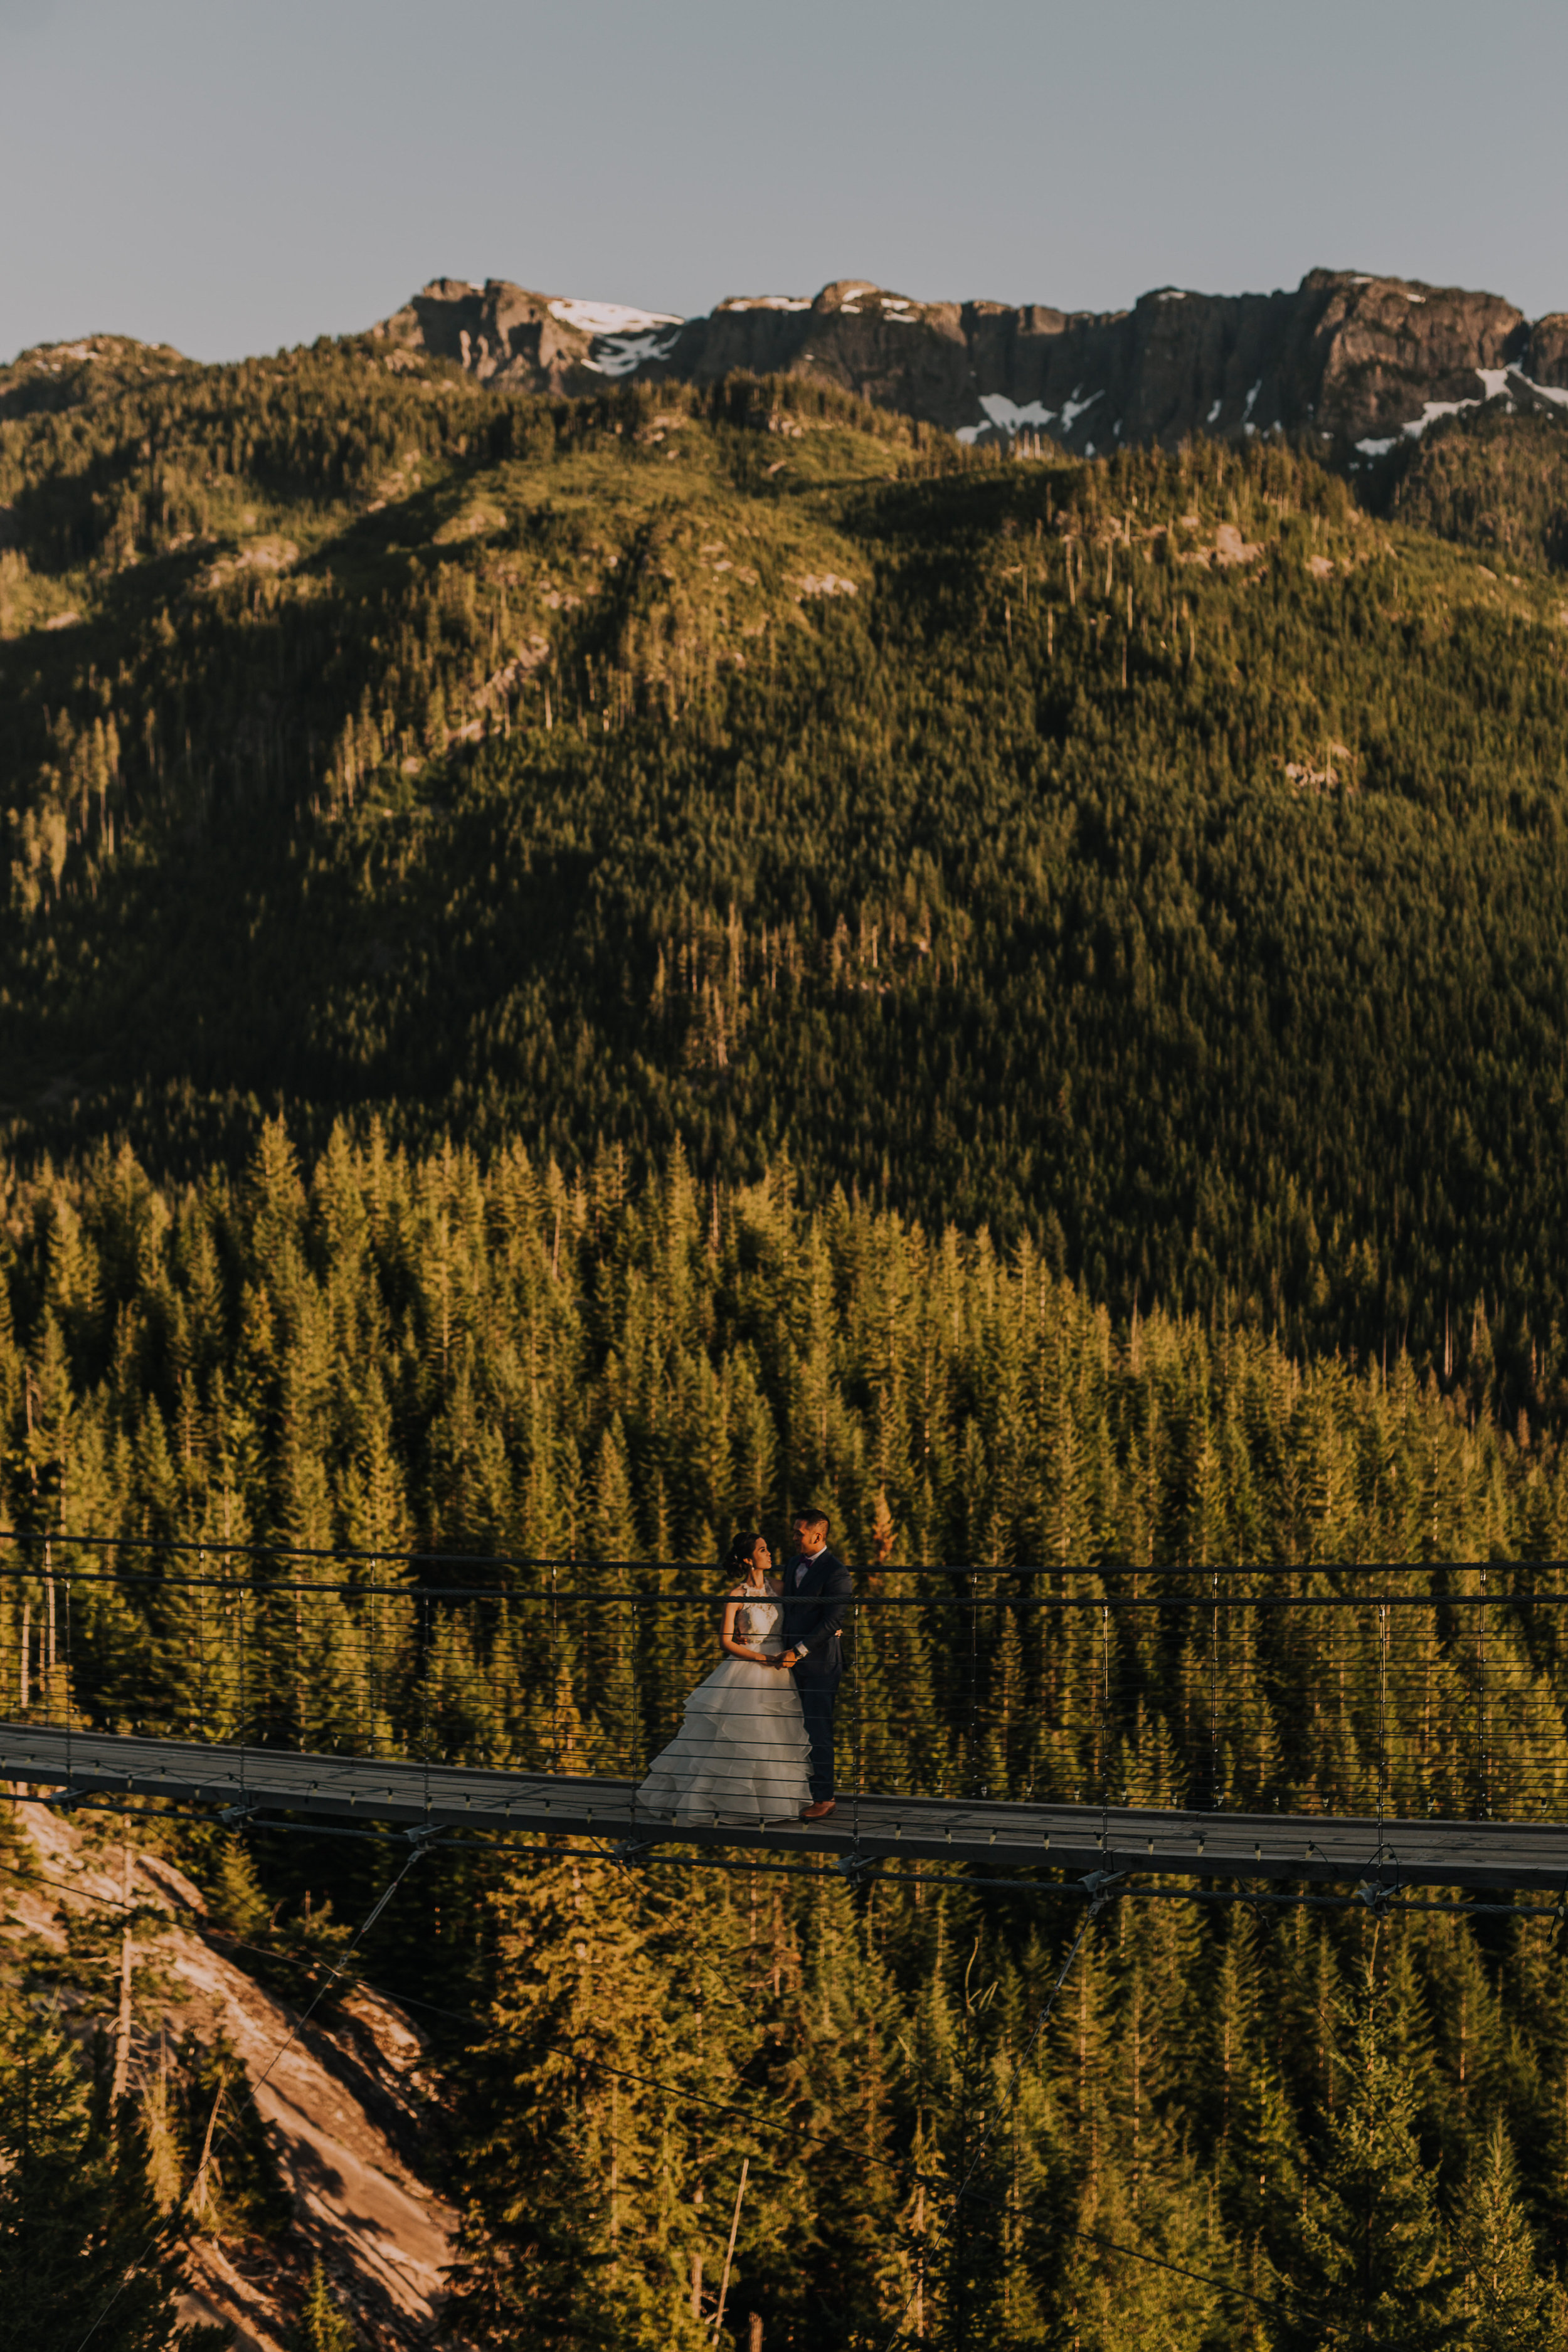 Squamish Wedding Photographer - Sea to Sky Gondola Wedding Photos -  Vancouver Wedding Photographer & Videographer - Sunshine Coast Wedding Photos - Sunshine Coast Wedding Photographer - Jennifer Picard Photography - IMG_4970.jpg